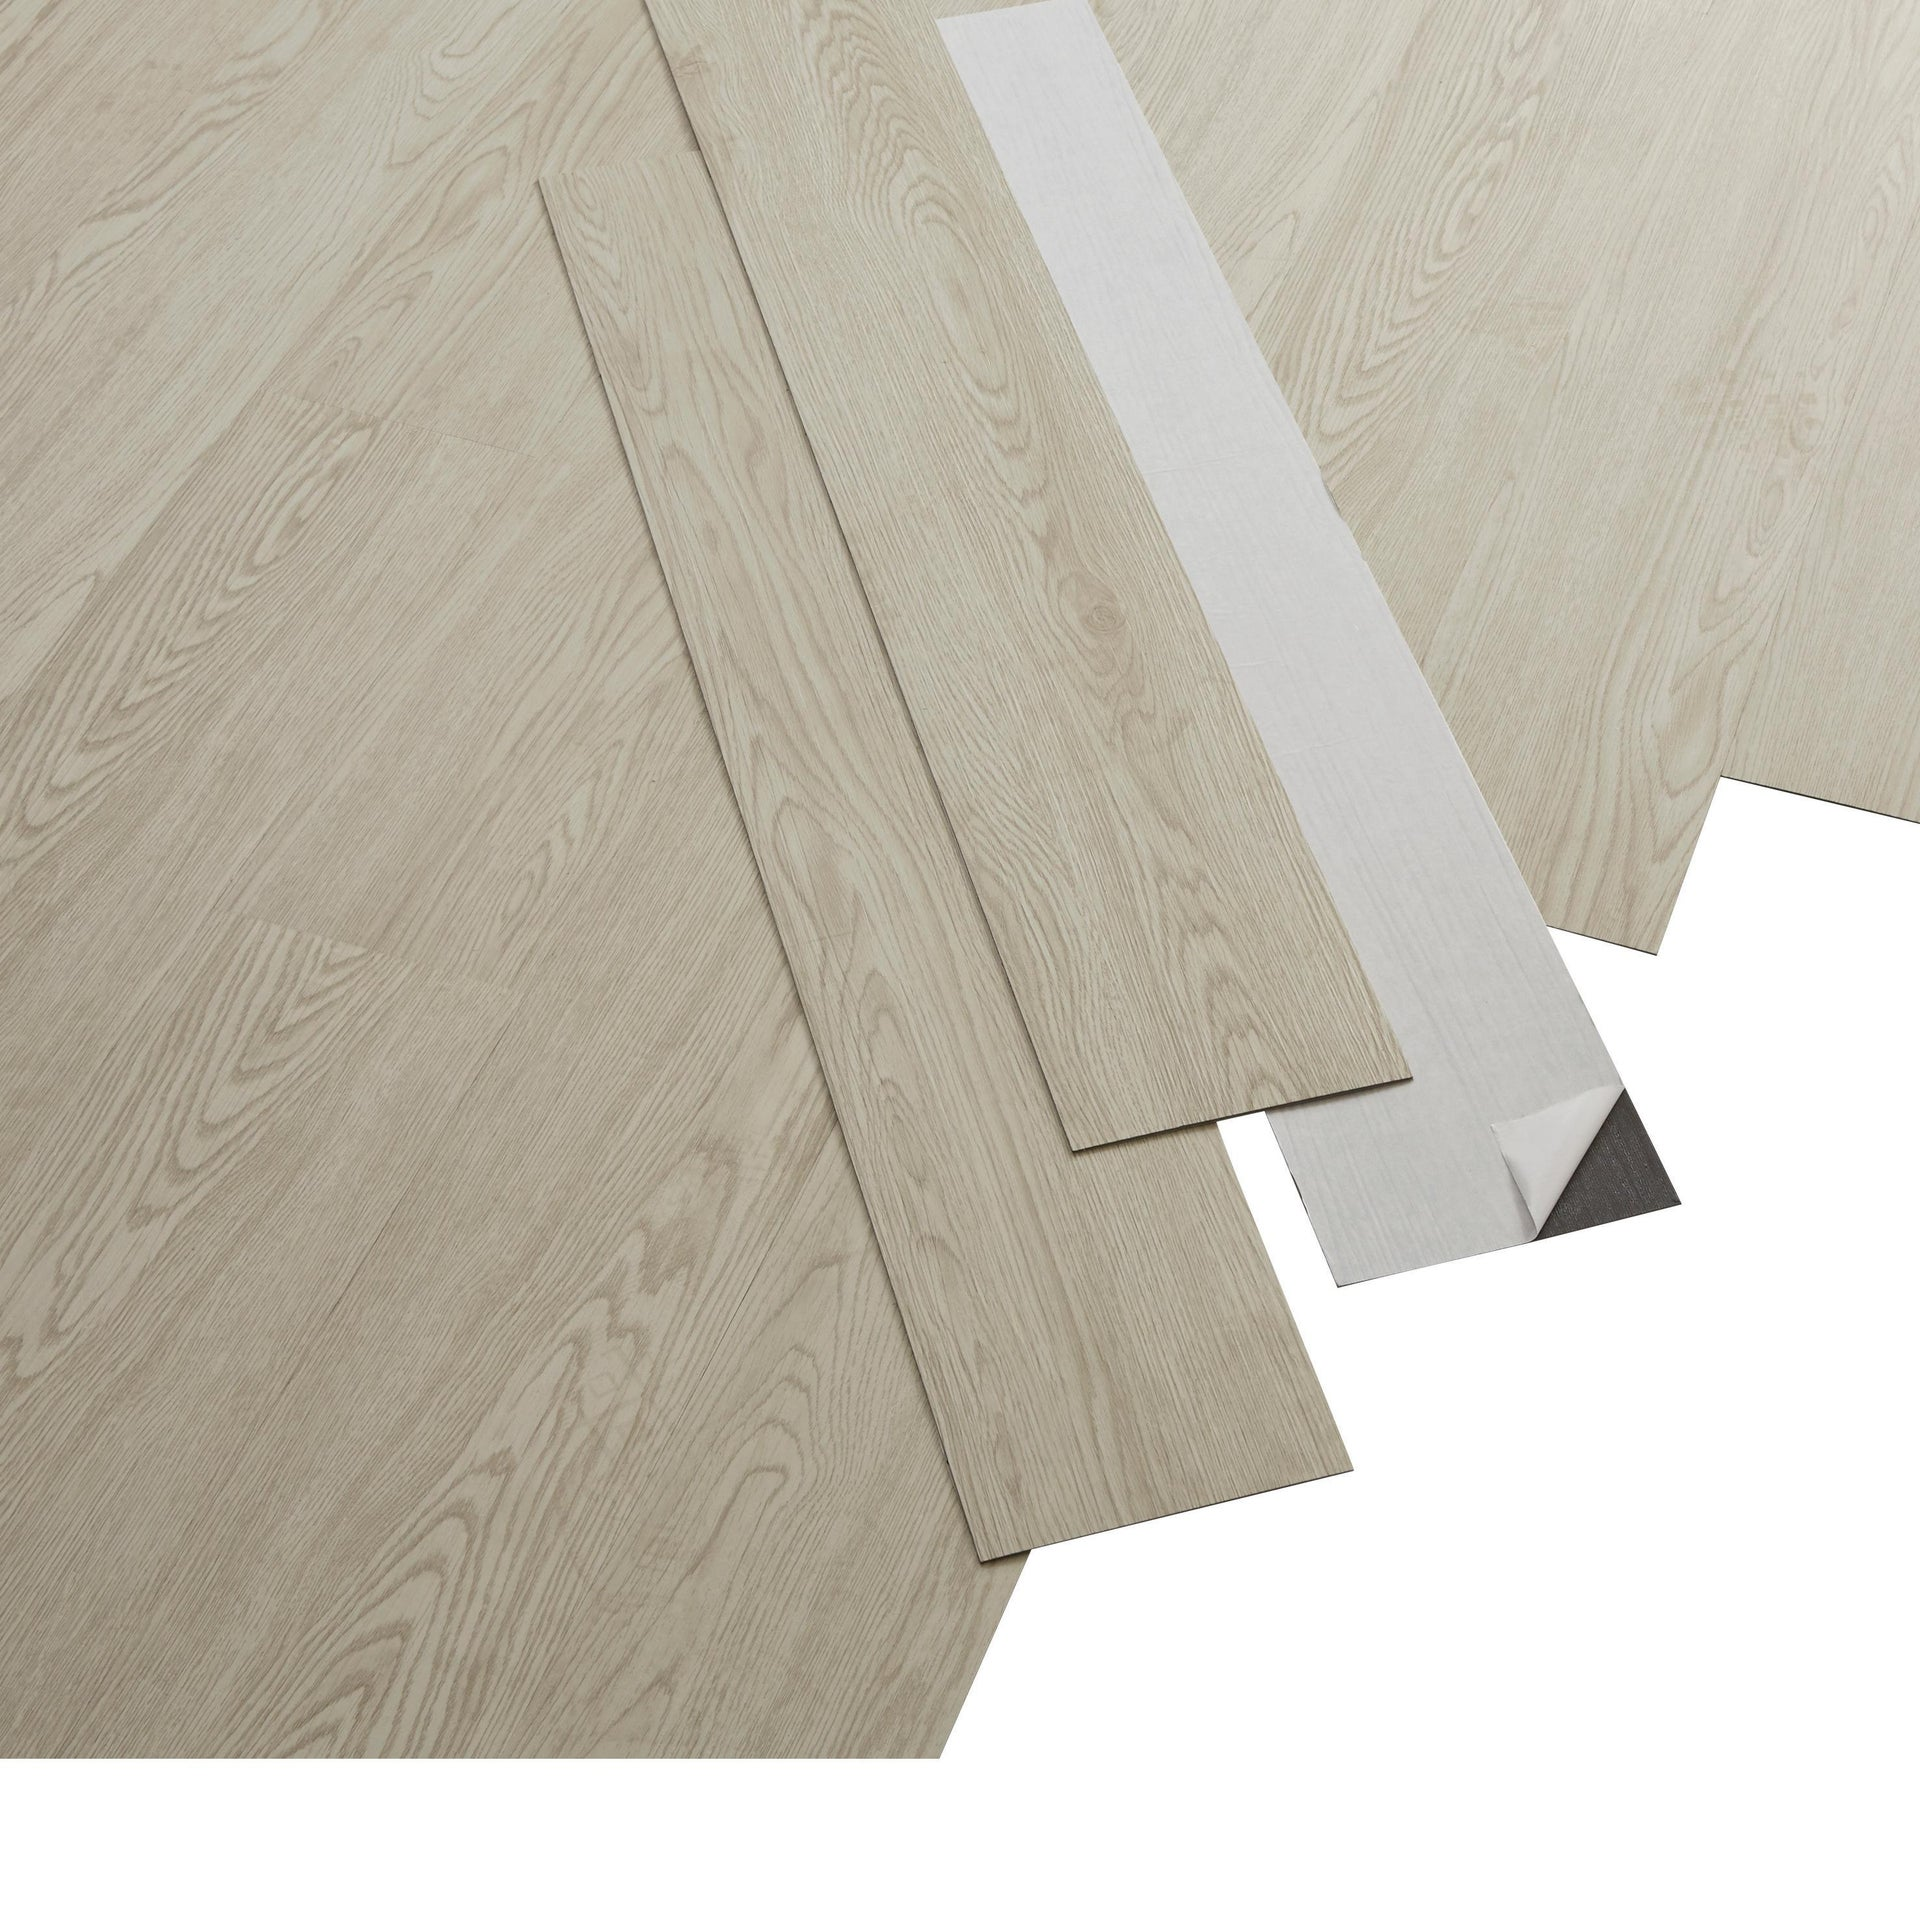 Pavimento PVC adesivo Whiwood Sp 1.8 mm bianco - 3